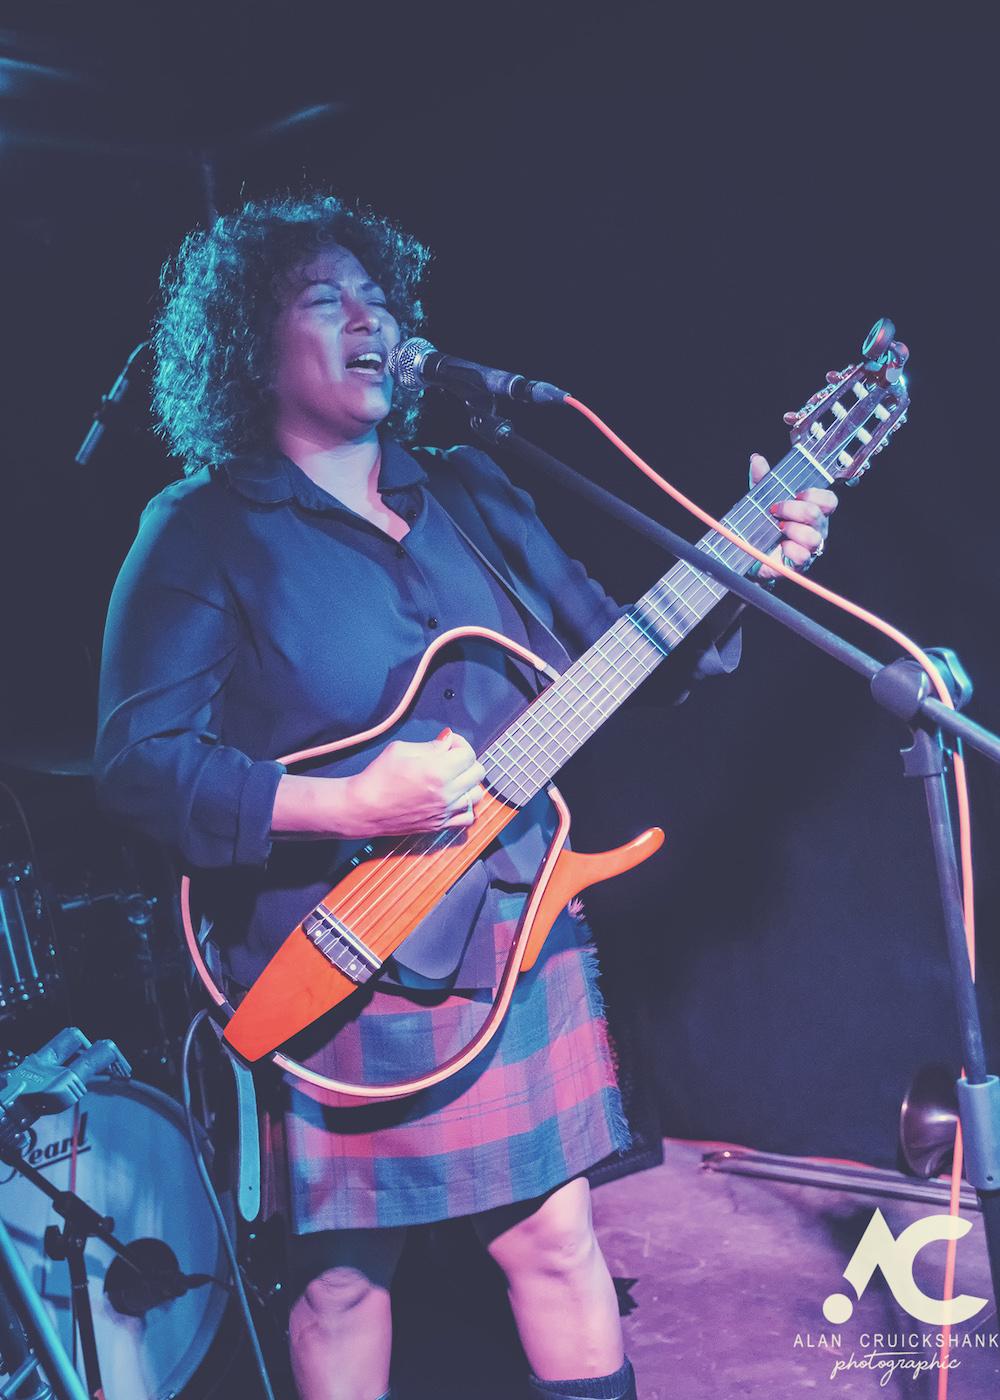 coca tenorio Inverness November 2018 8 - Tom McGuire & The Brassholes, 8/11/2018 - Images